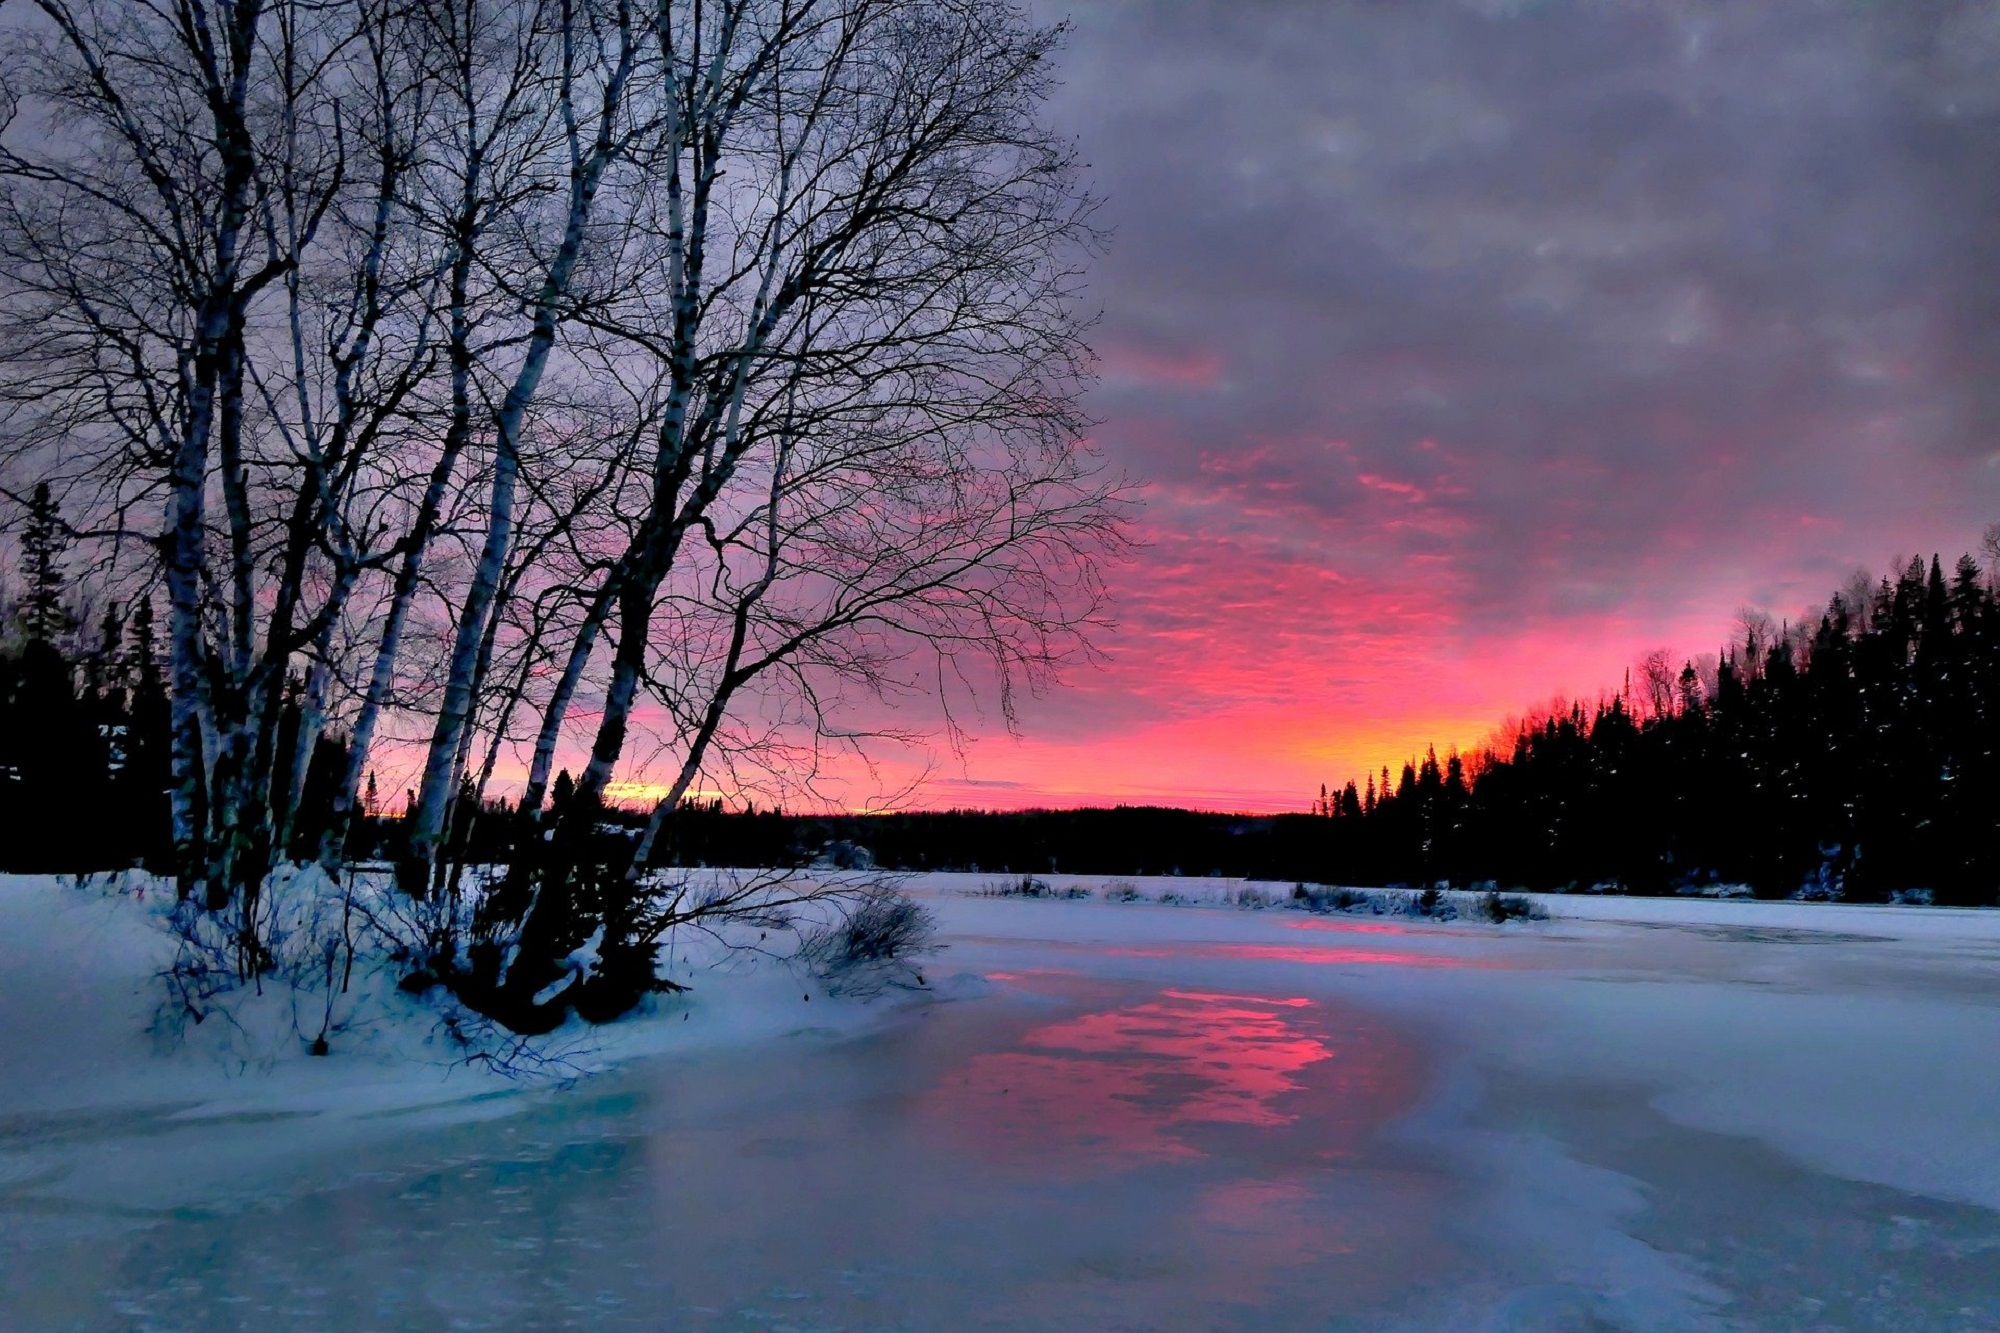 sunset-4636419_1920